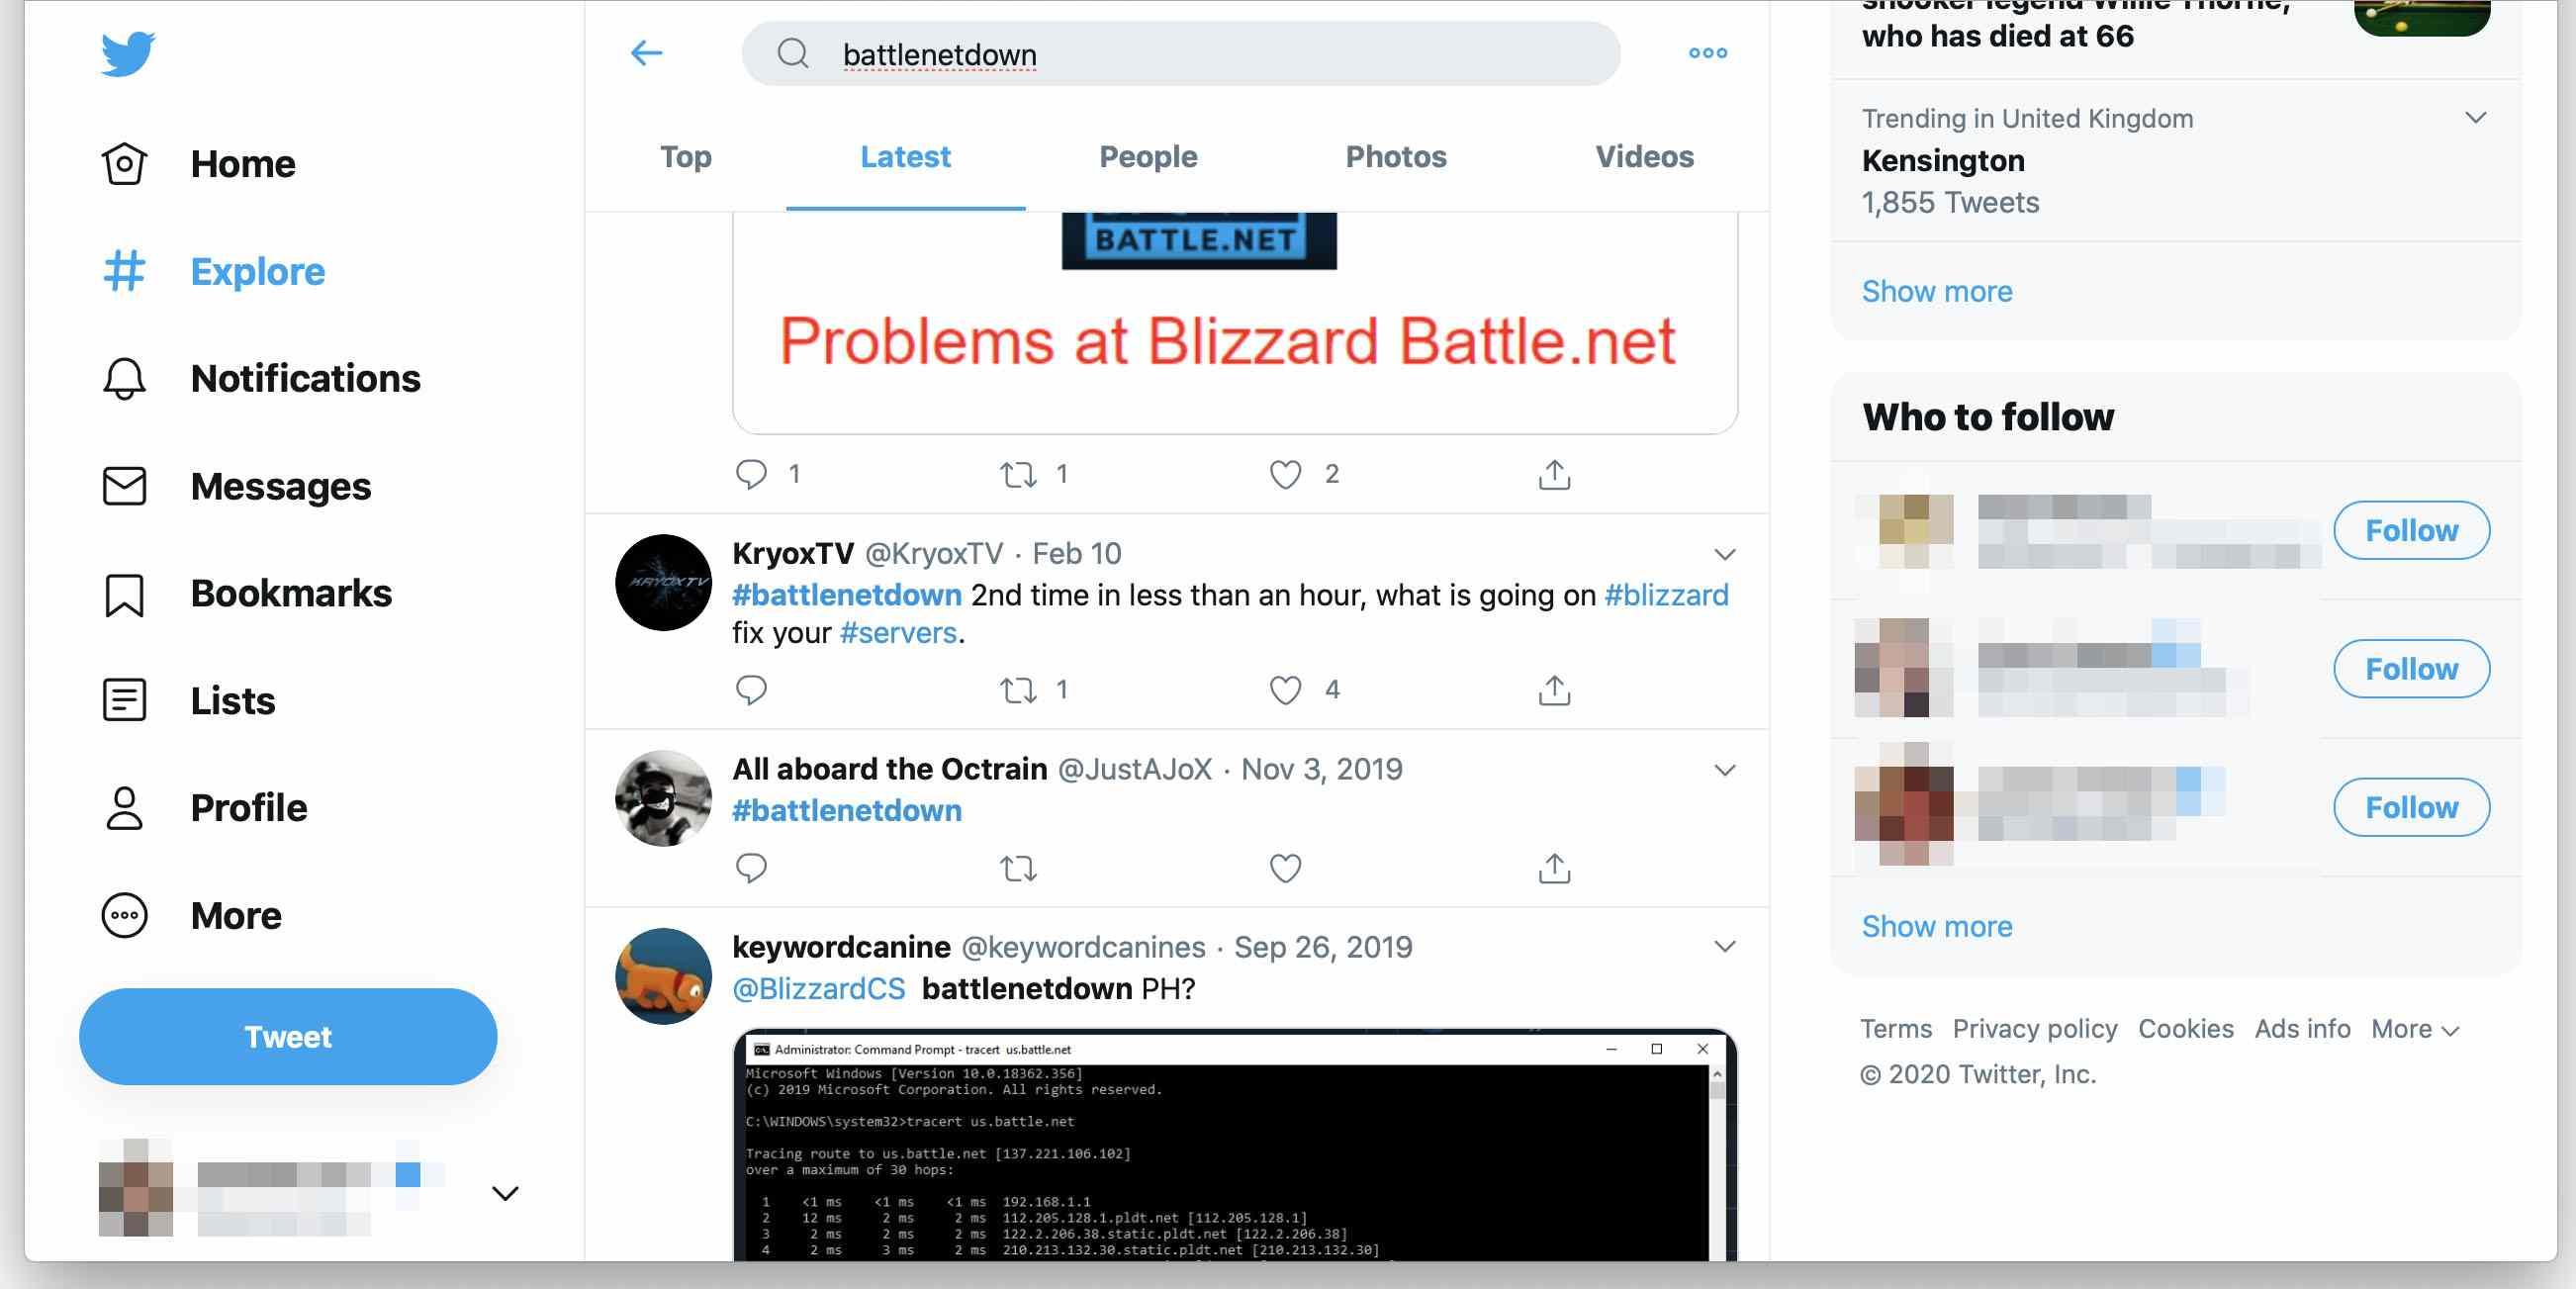 Battlenetdown hashtag on Twitter